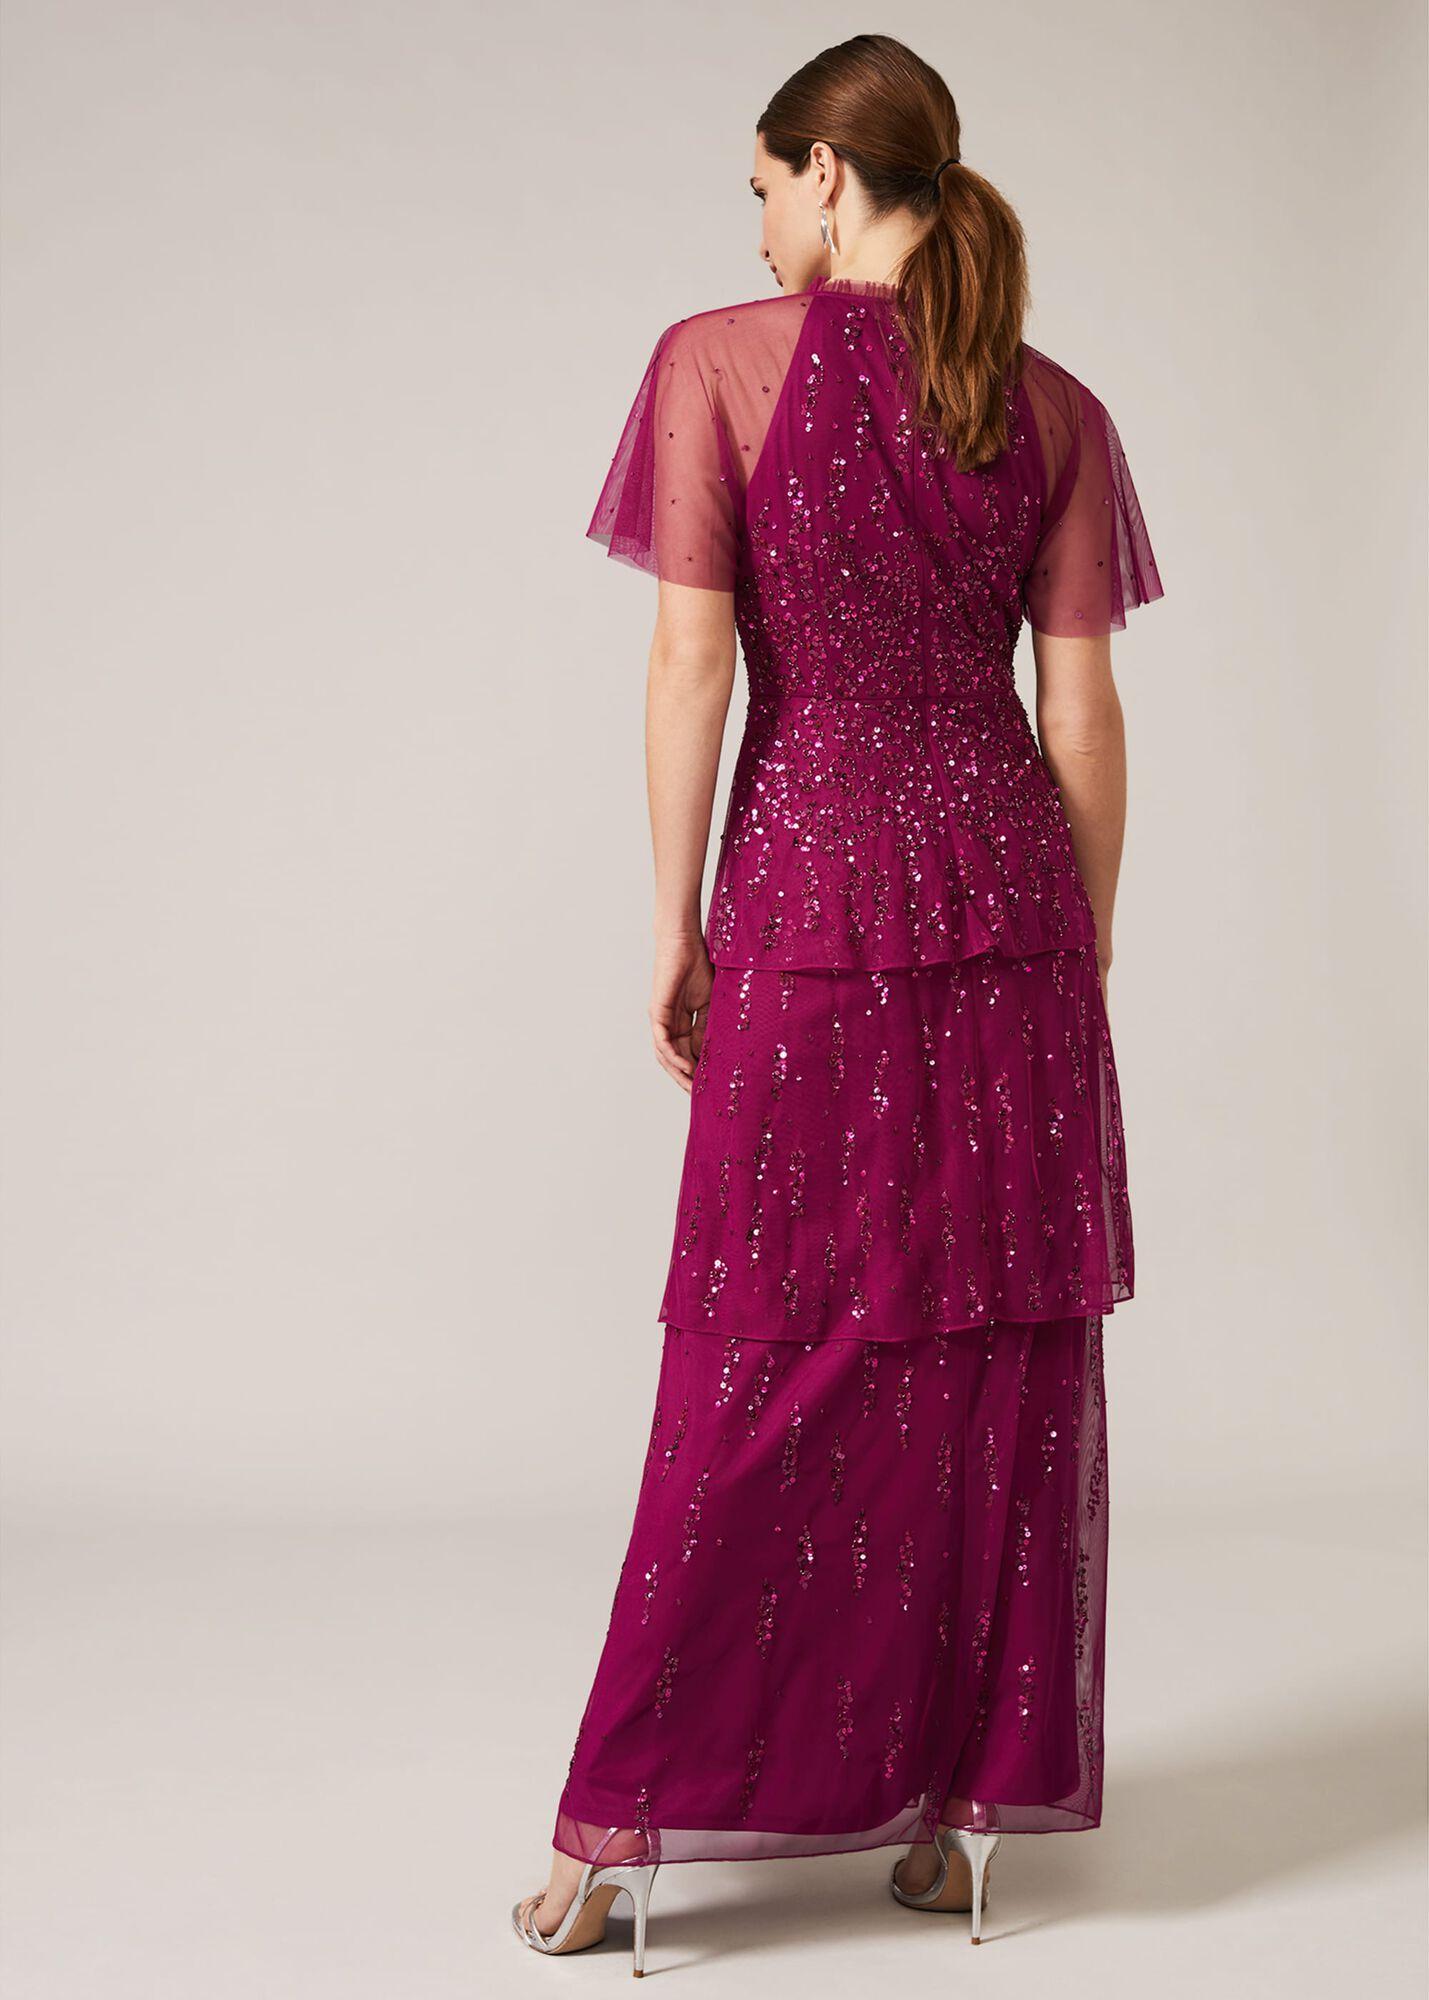 209427720-02-liliana-tiered-embellished-dress.jpg?sw=1429&sh=2000&strip=false